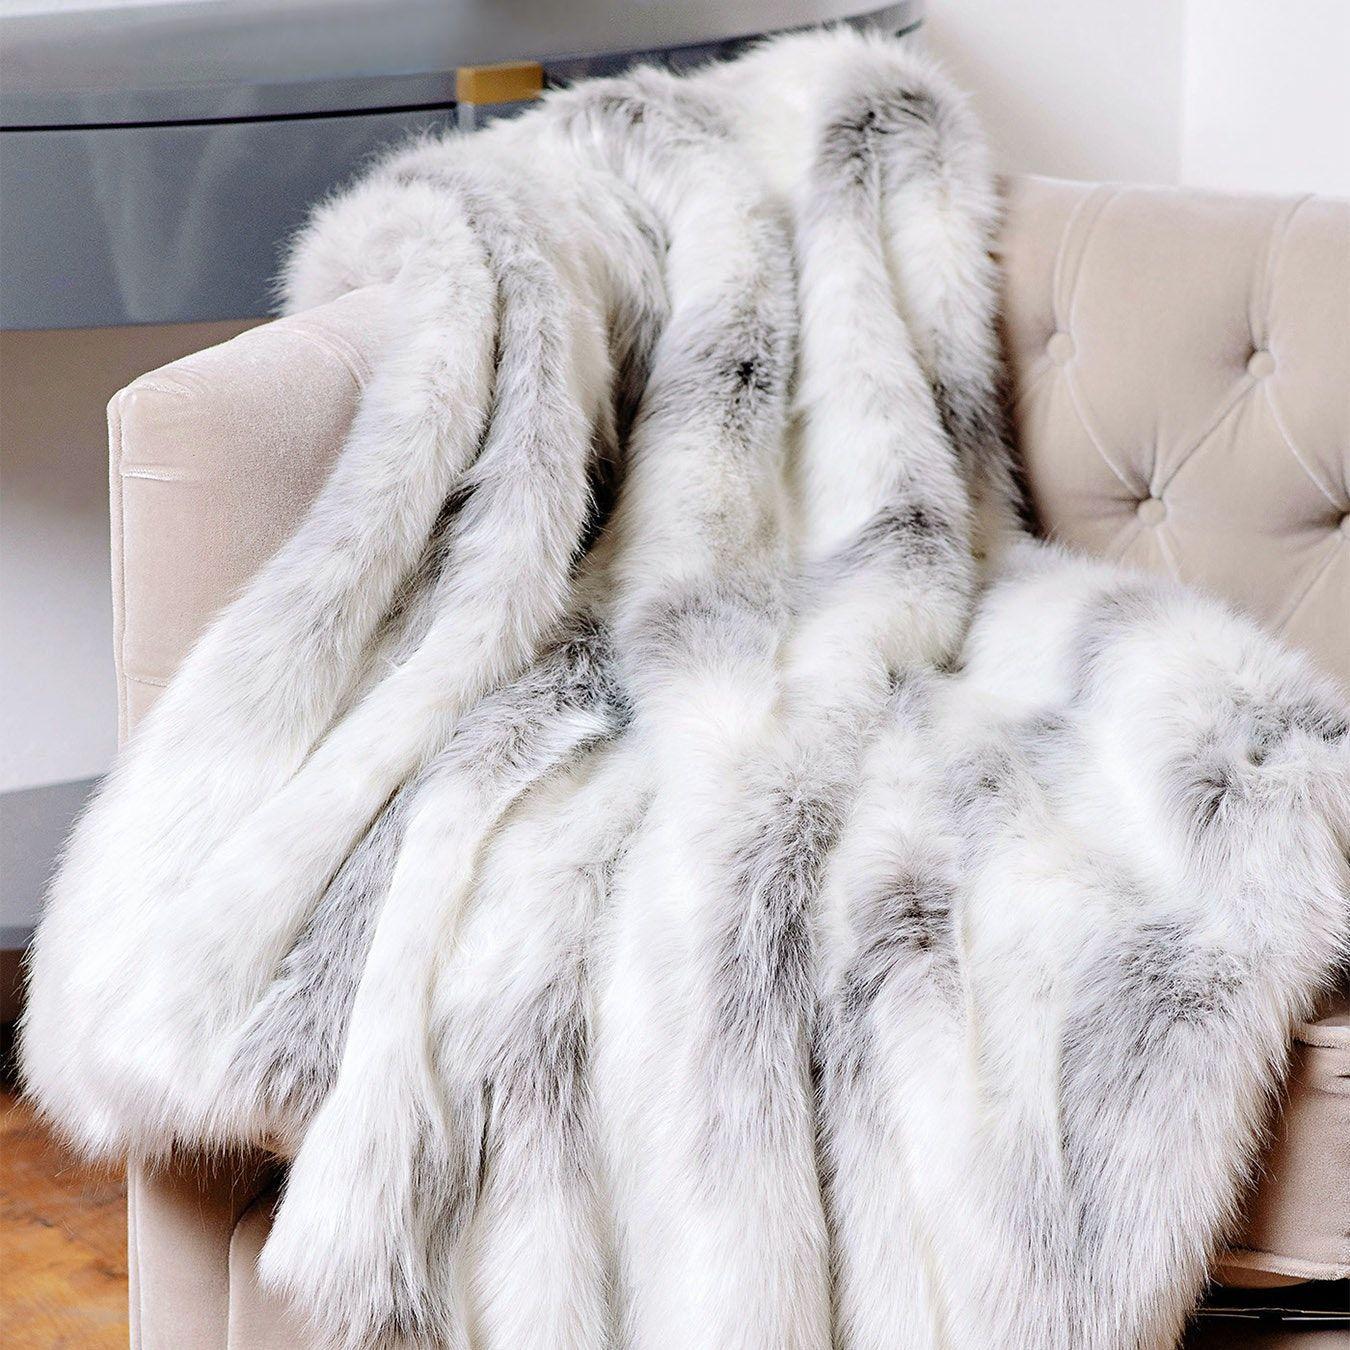 Limited Edition Throw White Grey Icelandic Fox Faux Fur In 2021 Faux Fur Throw Fur Blanket Fur Throw White faux fur throw blanket